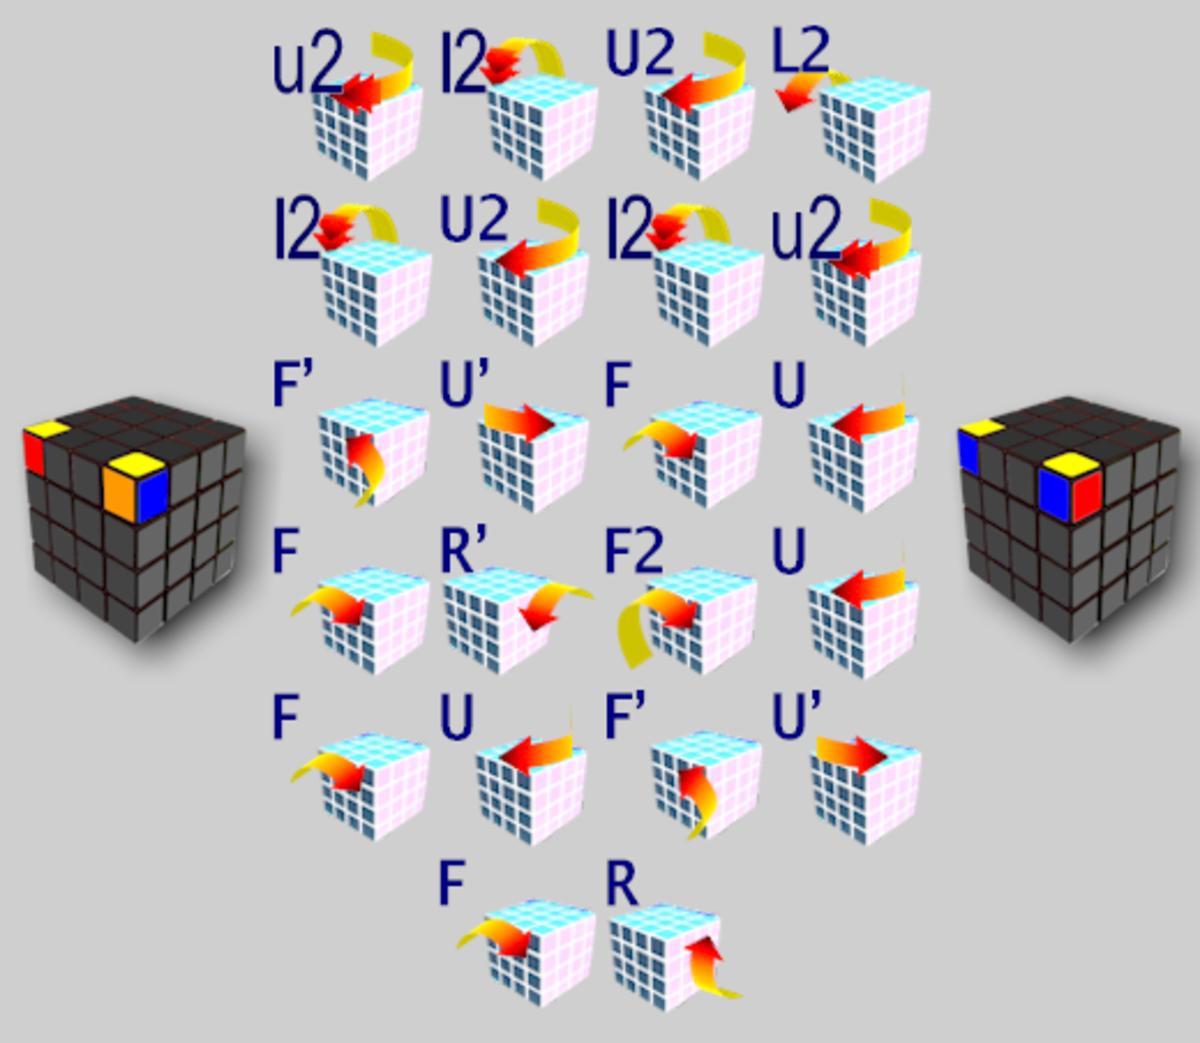 u2 - l2 - U2 - L2 - l2 - U2 - l2 - u2 - F' - U' - F - U - F - R' - F2 - U - F - U - F' - U' - F - R